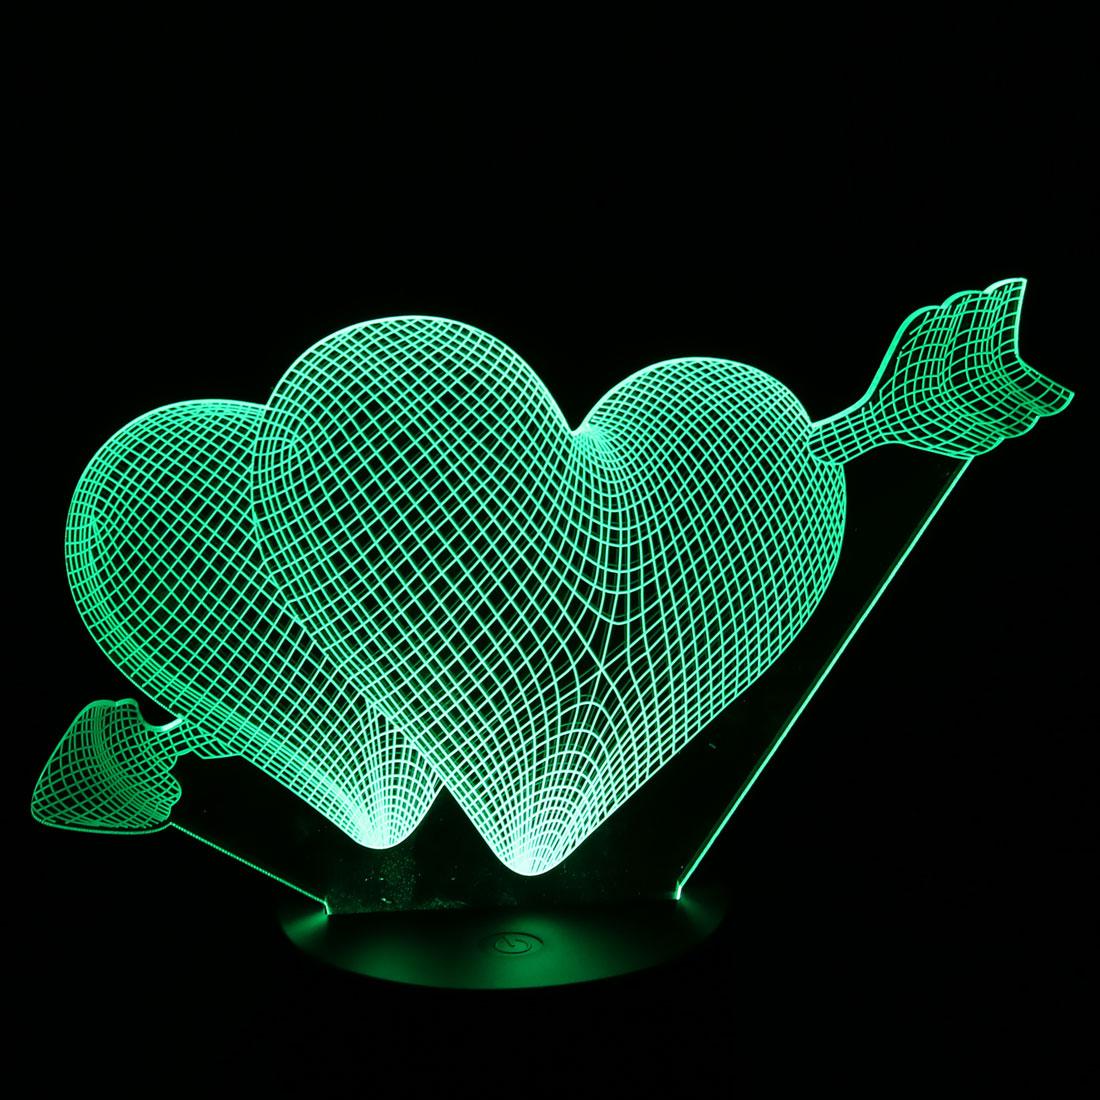 DC 5V Cupid Arrow 3D Acrylic LED Night Light 7 Color Change Desk Table Lamp - image 3 of 7